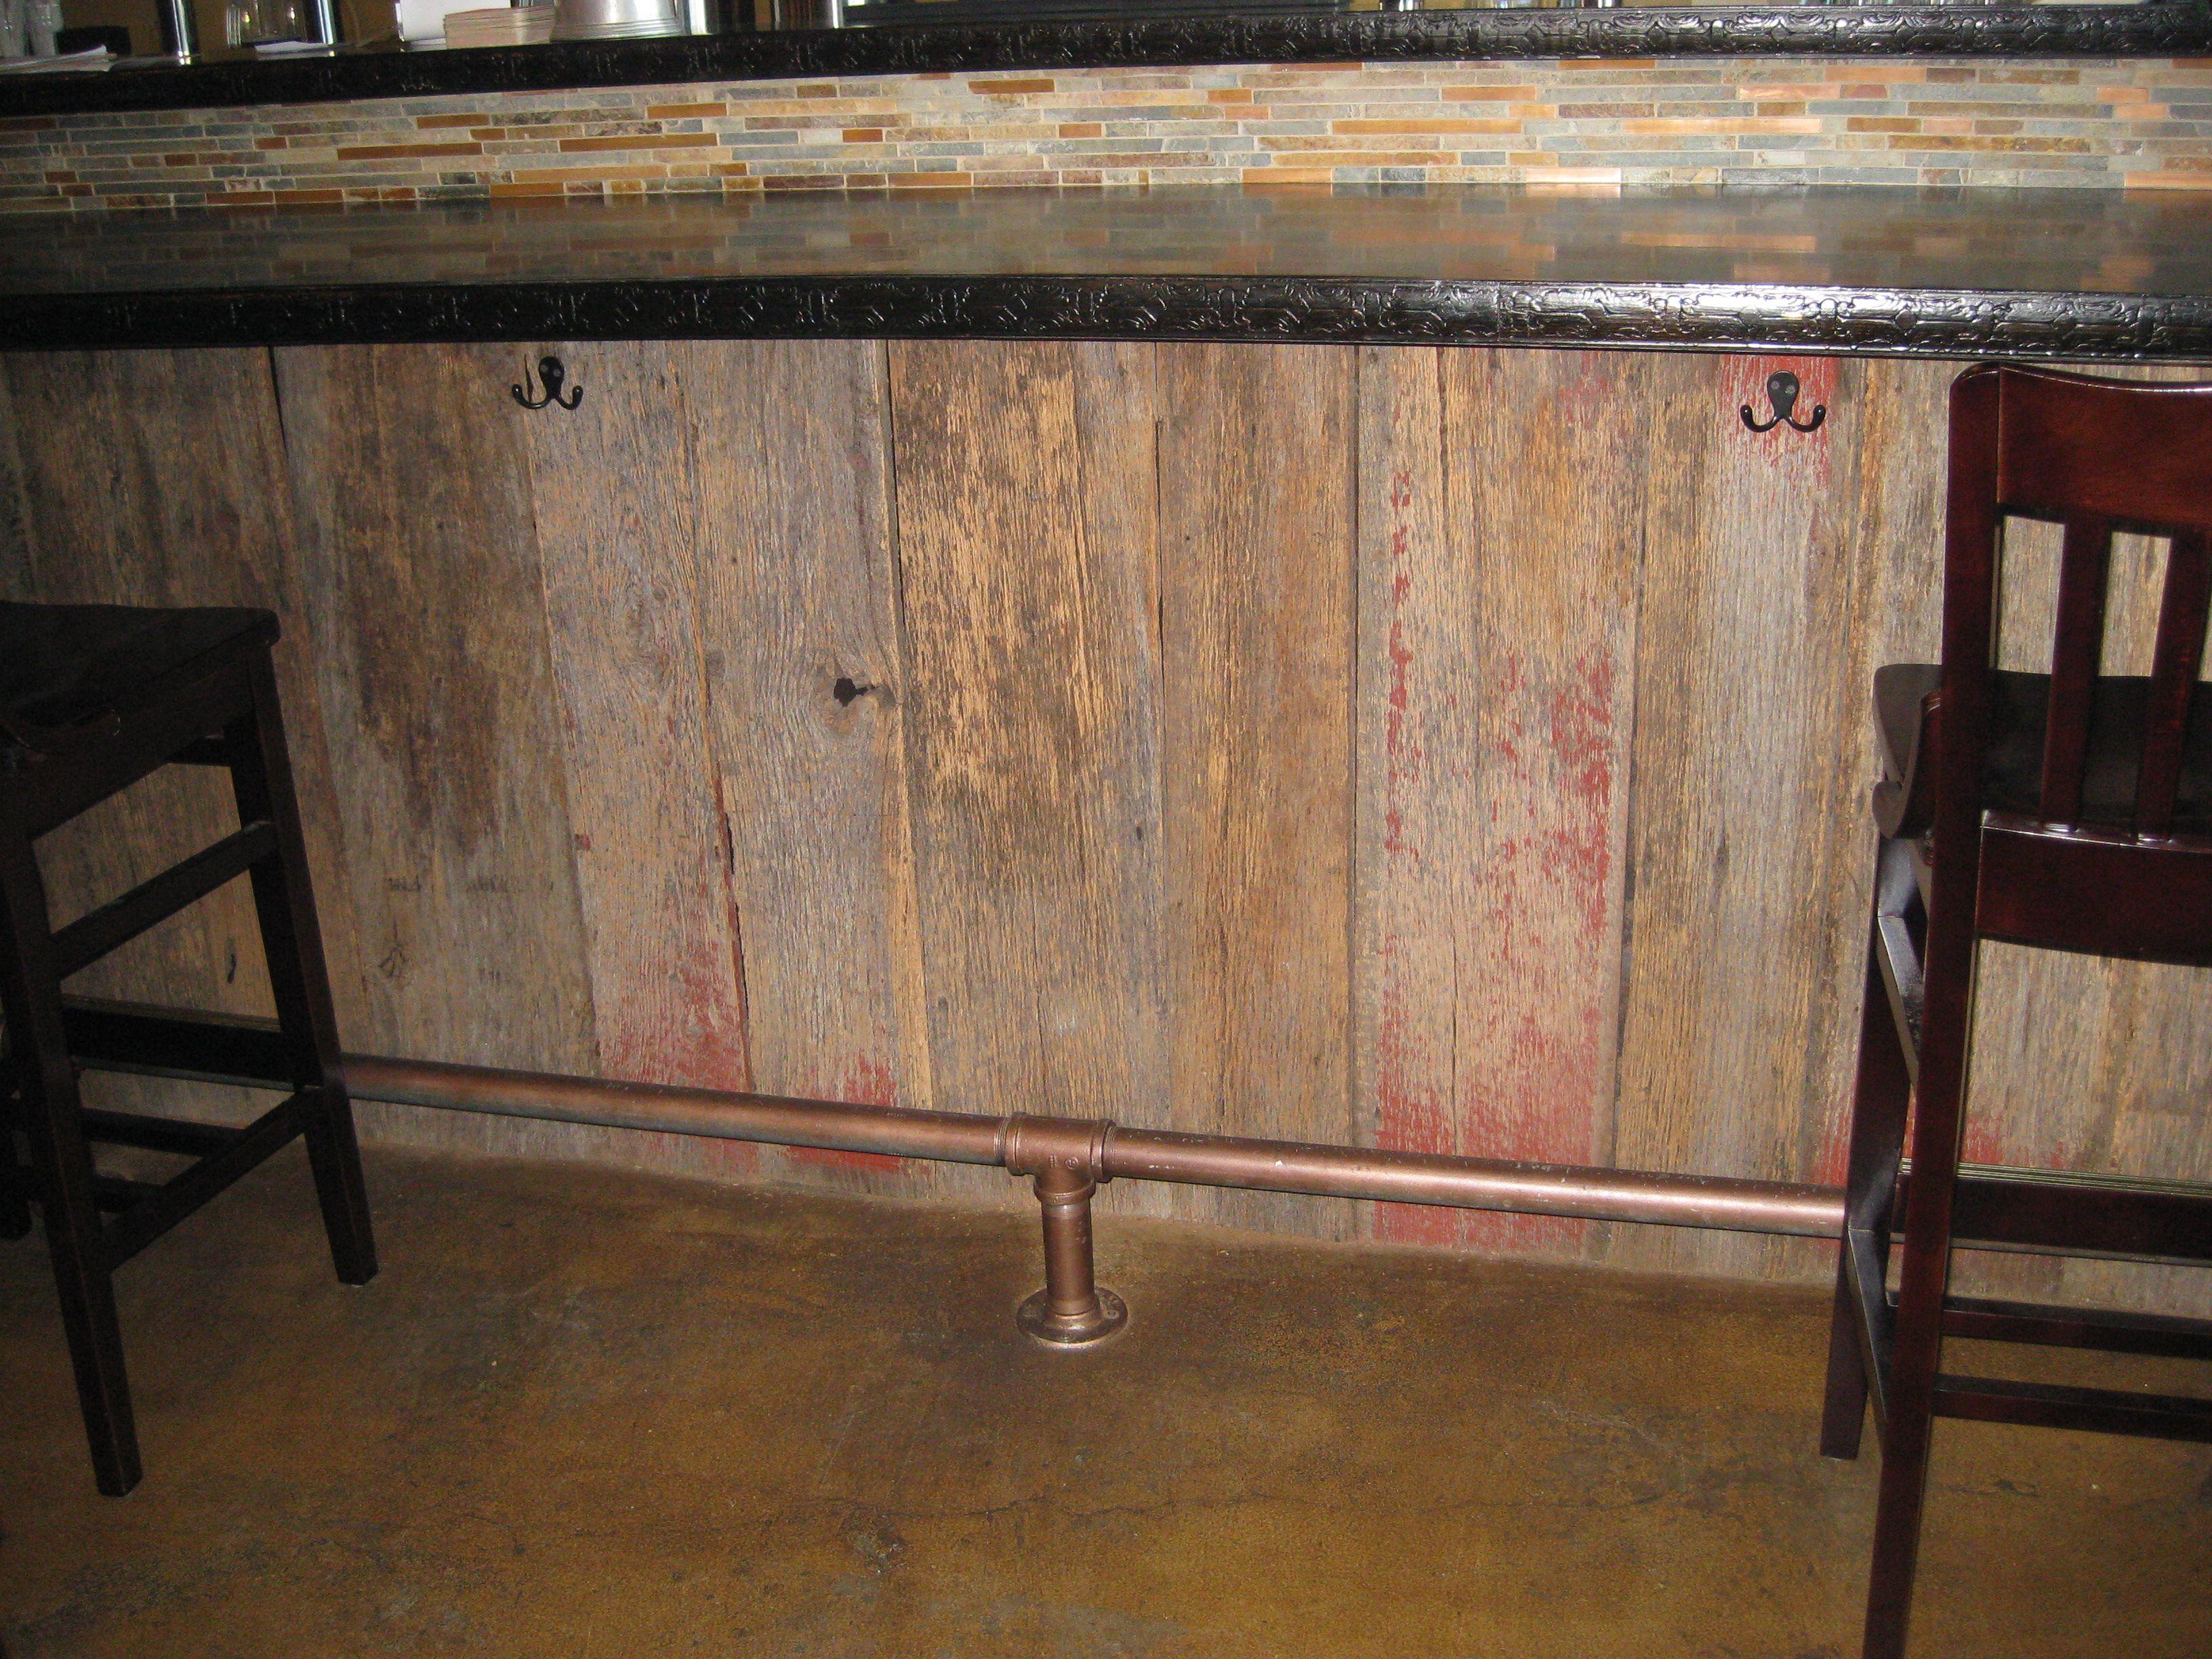 Reclaimed Lumber Red Greyboard Barn Wood Bar Facing